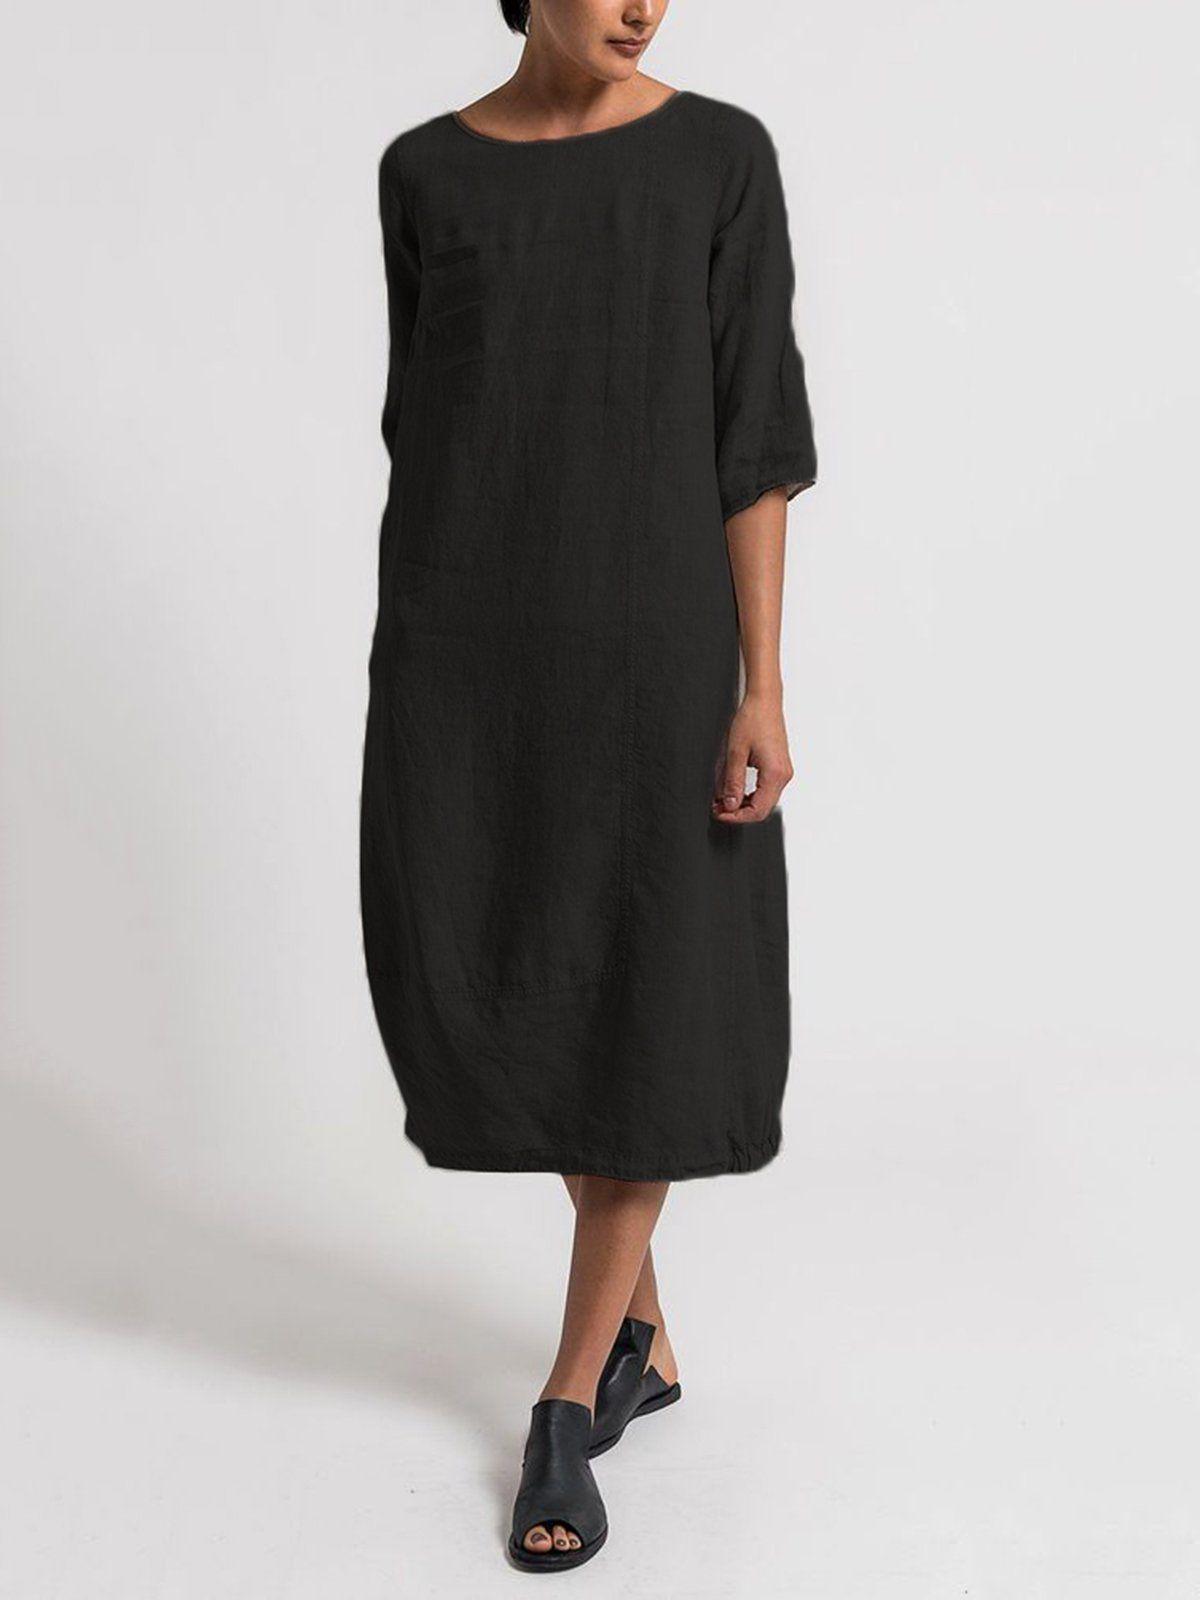 Crew Neck 3 4 Sleeve Casual Solid Casualdress Summer Dresses For Women Crewneck Dress Midi Shift Dress [ 1600 x 1200 Pixel ]